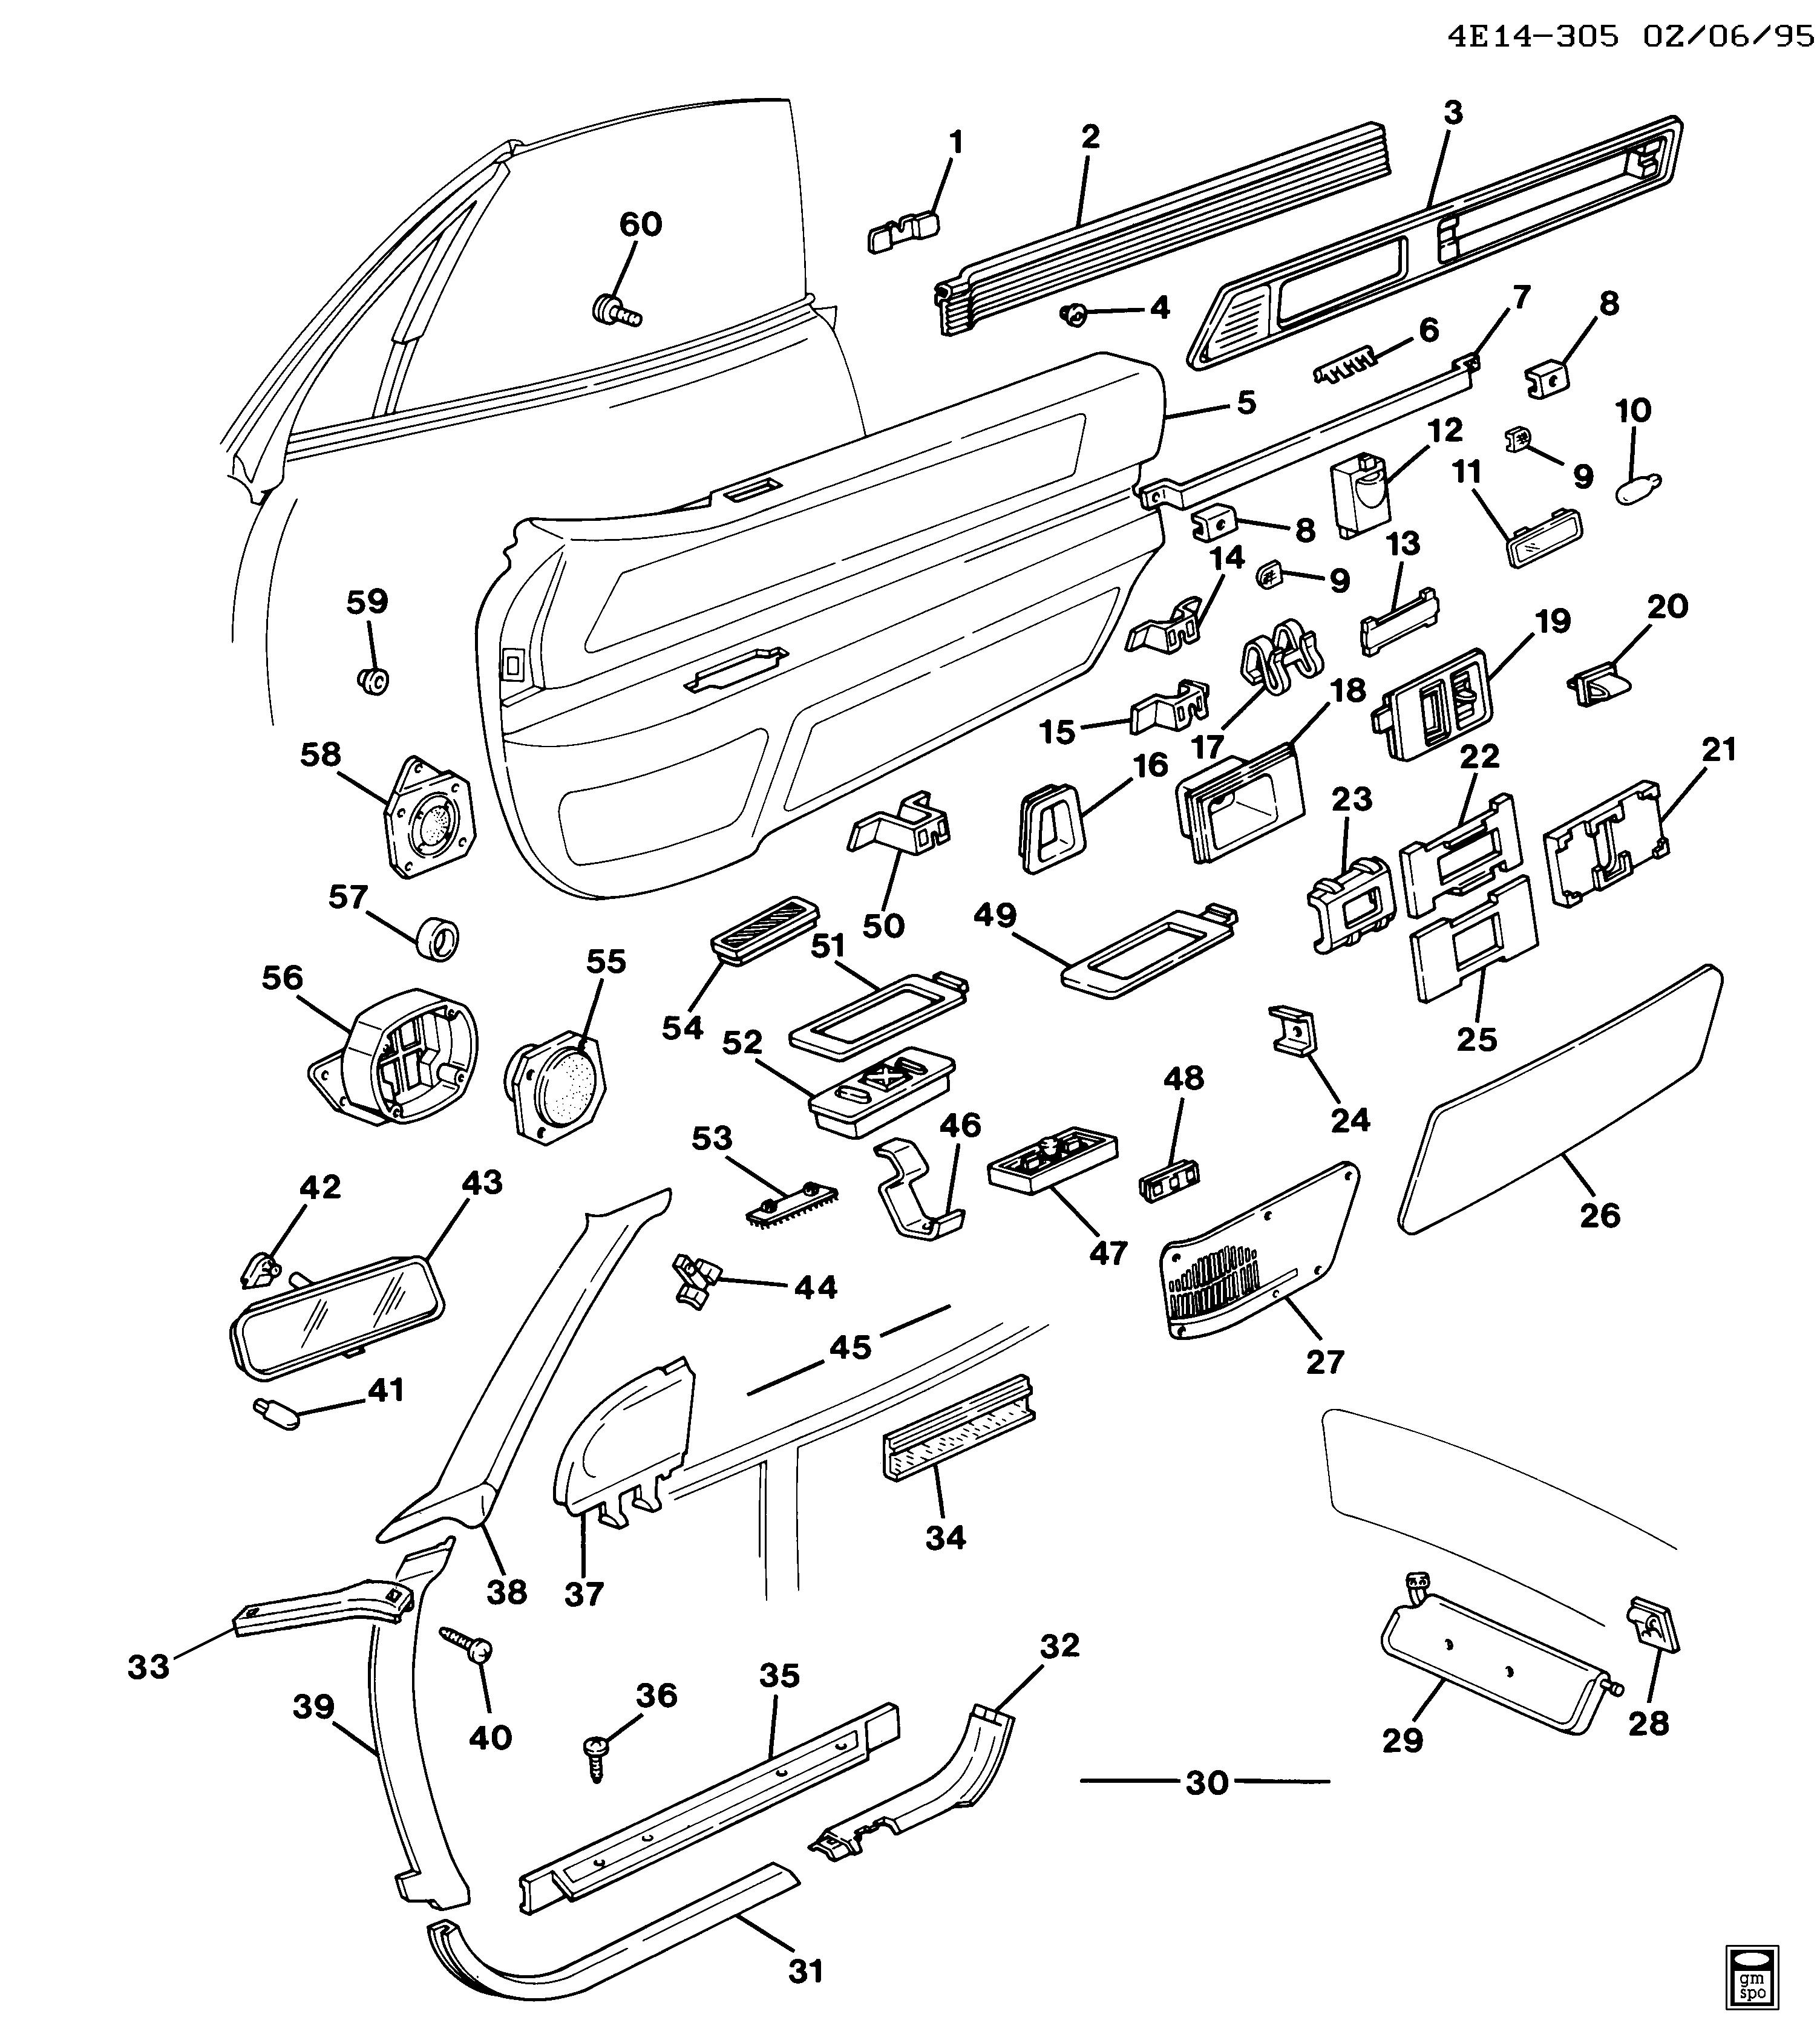 Buick Reatta Door Diagram Trusted Wiring Fuse Box E97 Trim Front U003e Epc Online Nemiga Com